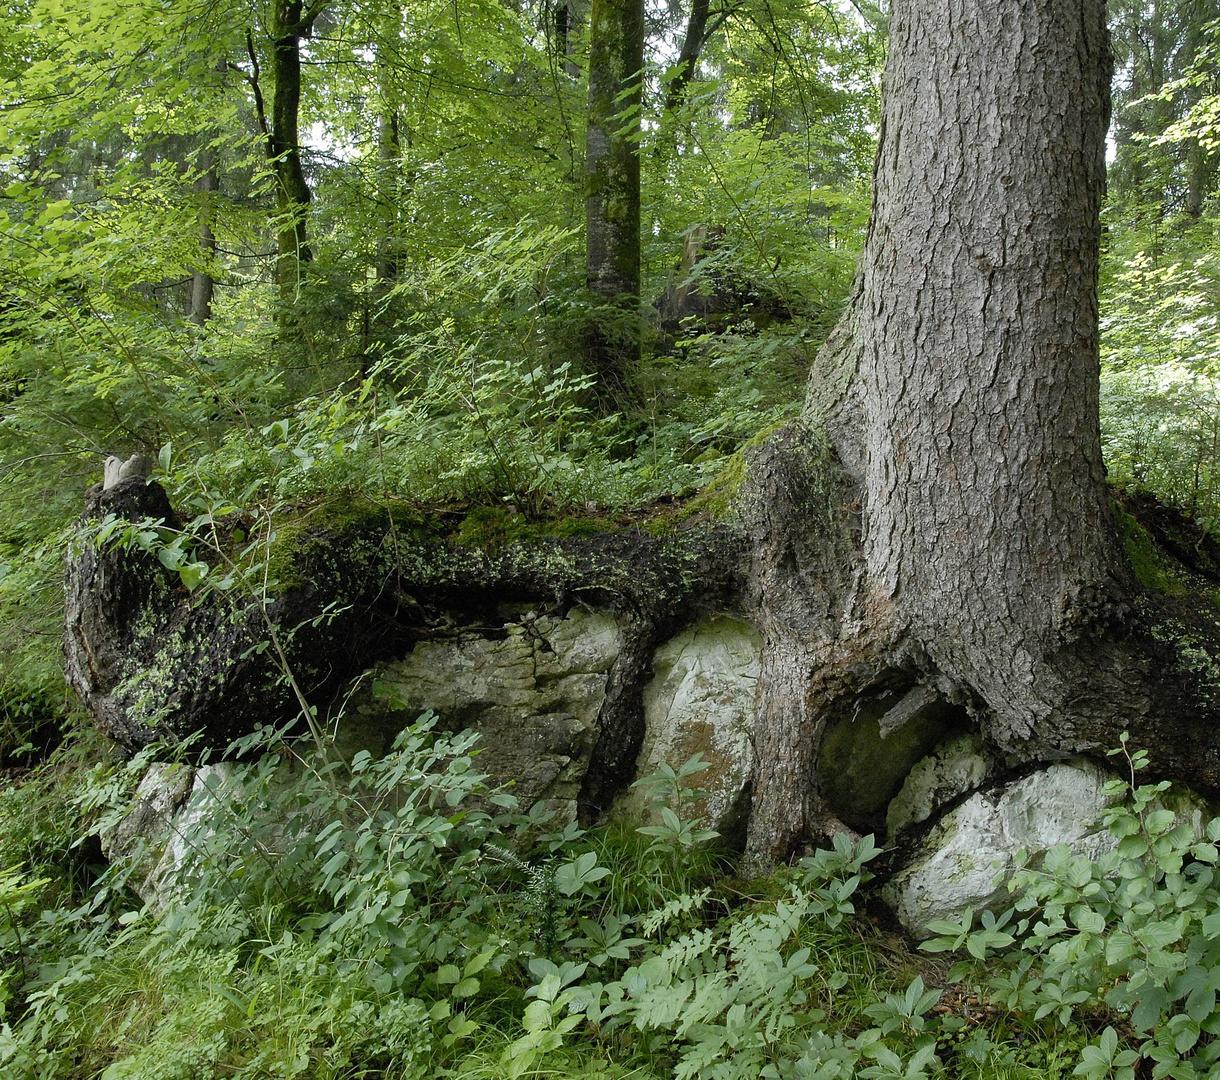 Picea Abies auf Kalkfelsen